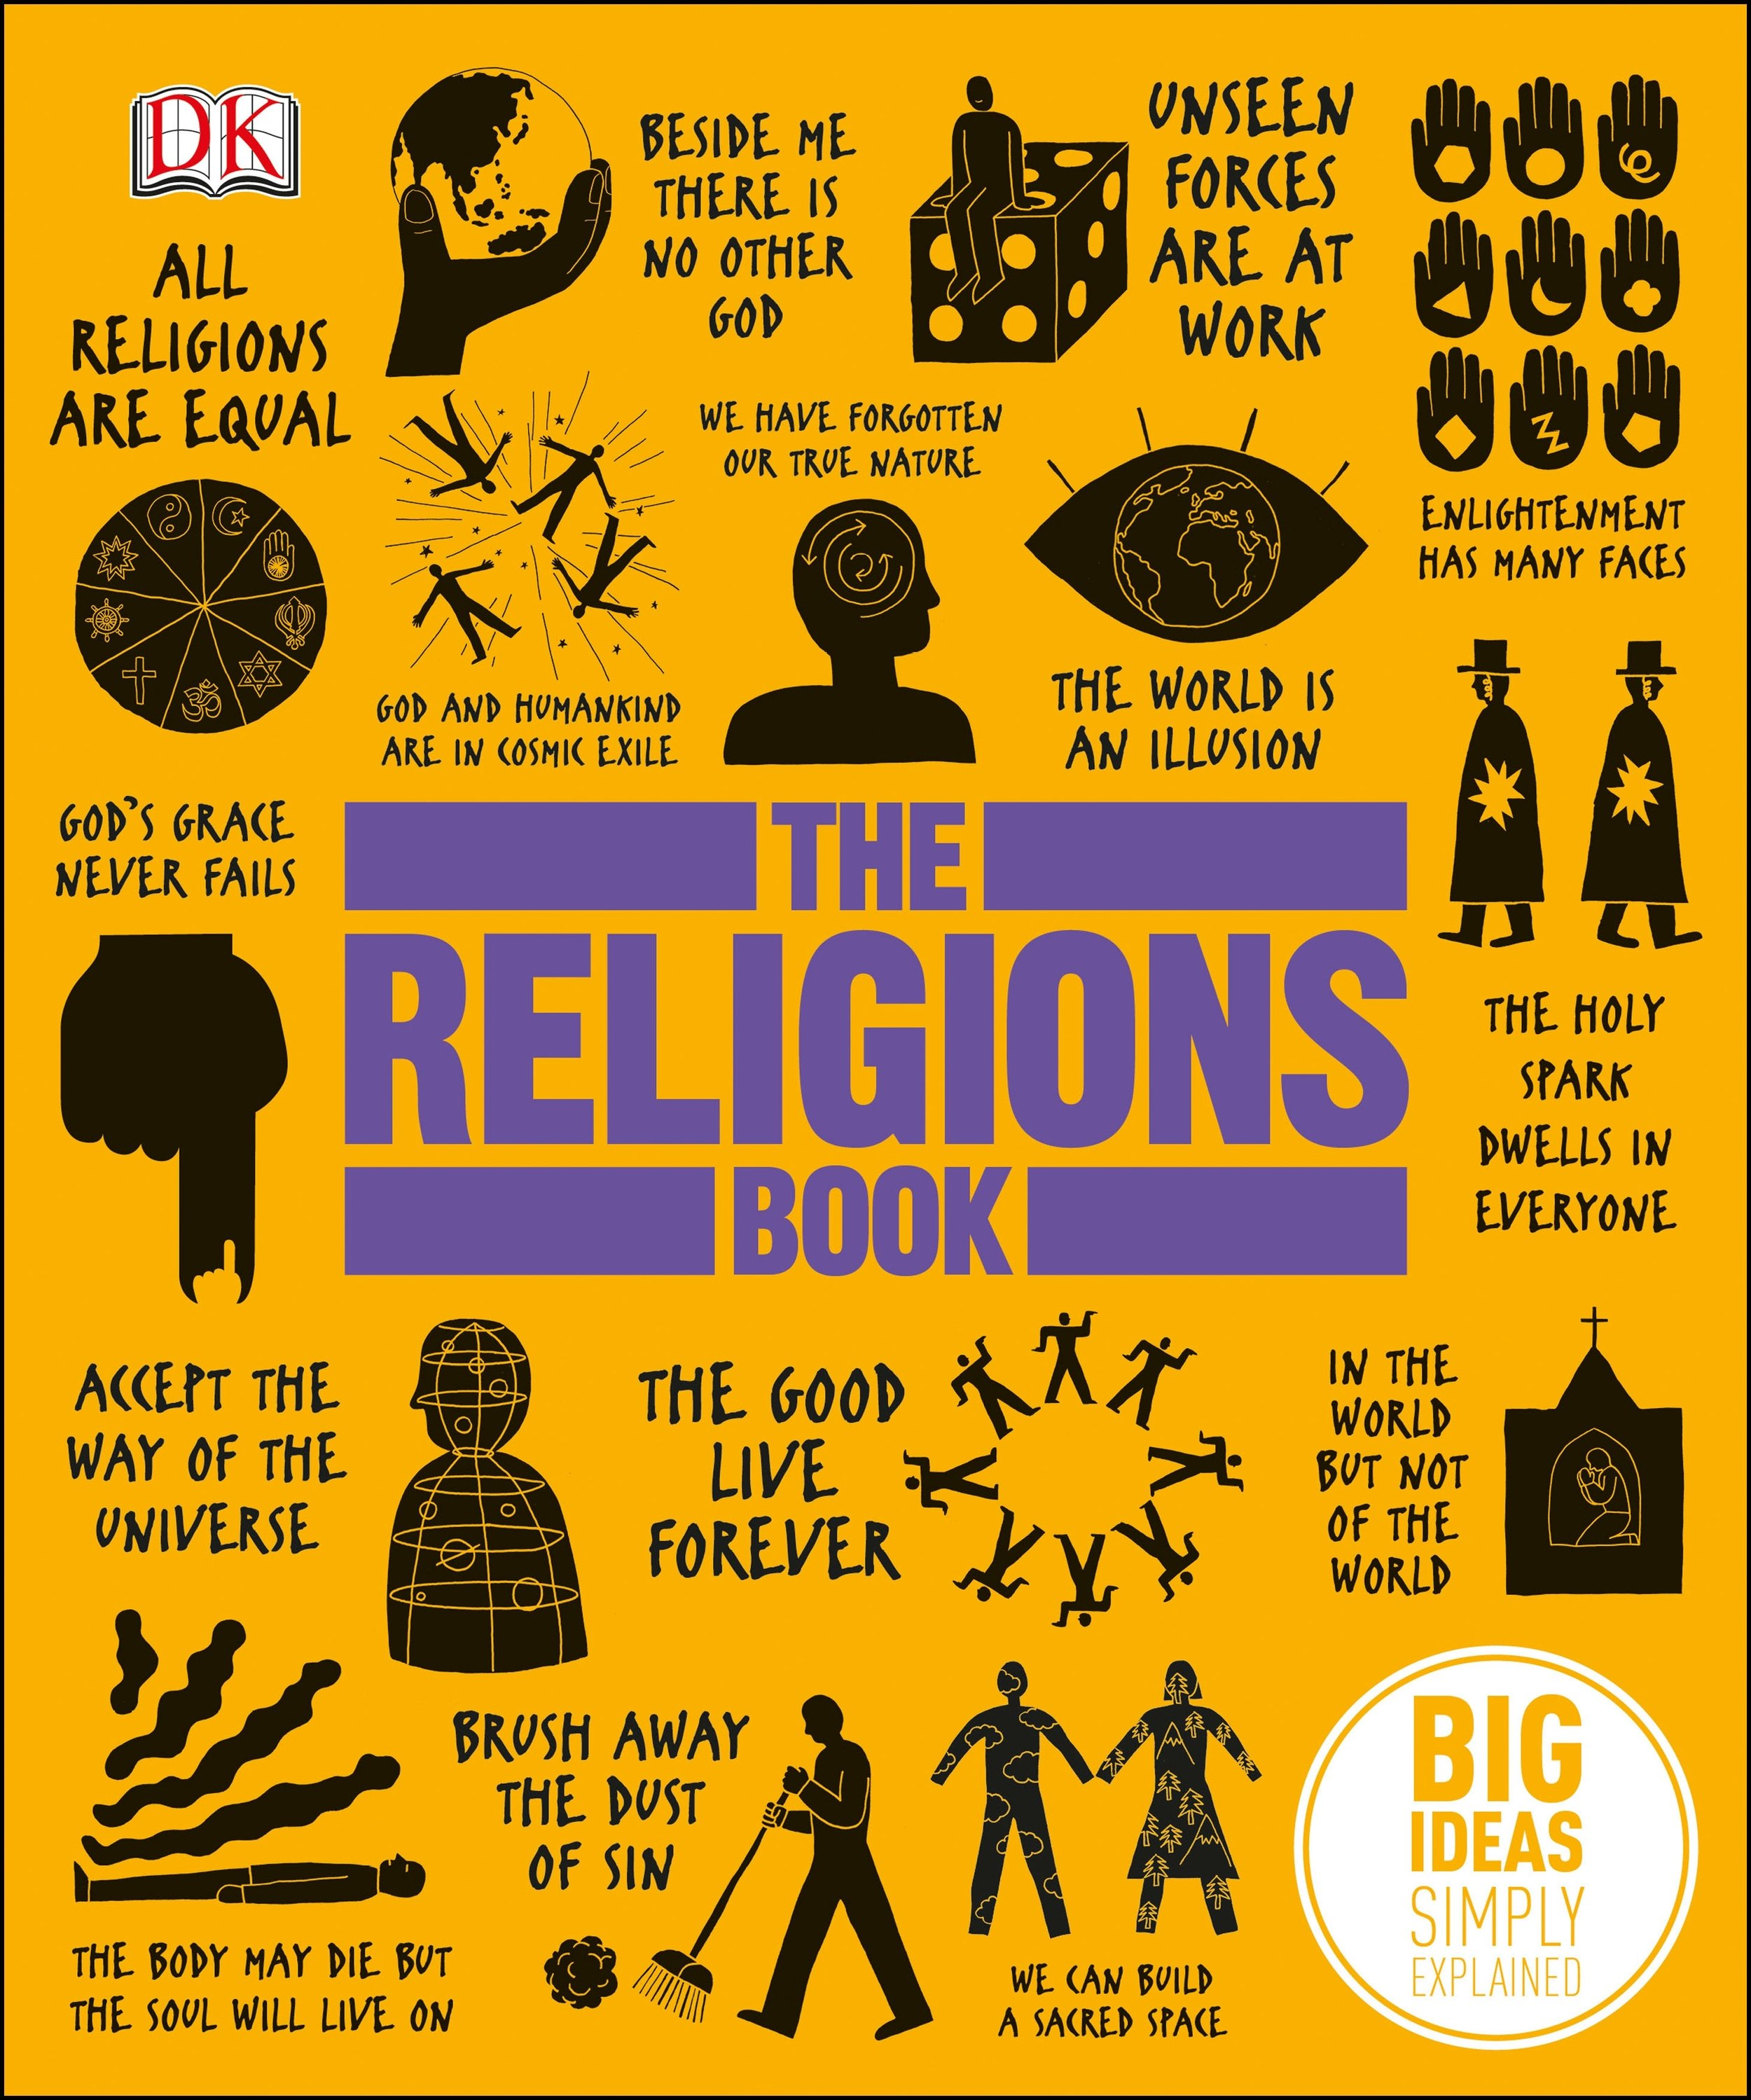 Books DK Big Ideas The Religion Book.jpg